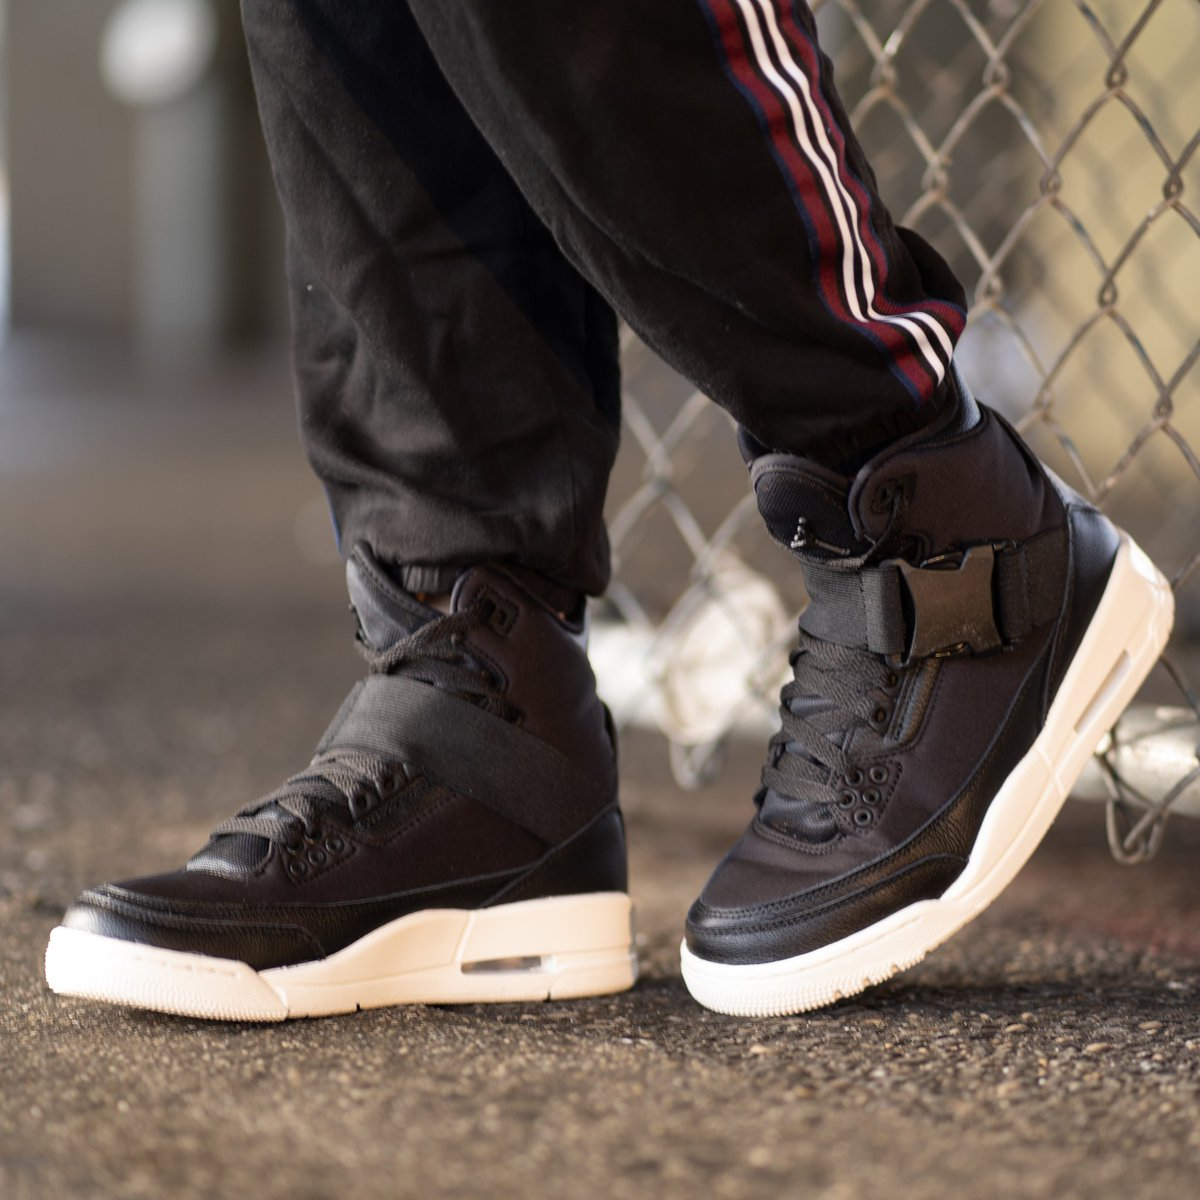 63cdb83366c970 GB S Sneaker Shop on Twitter